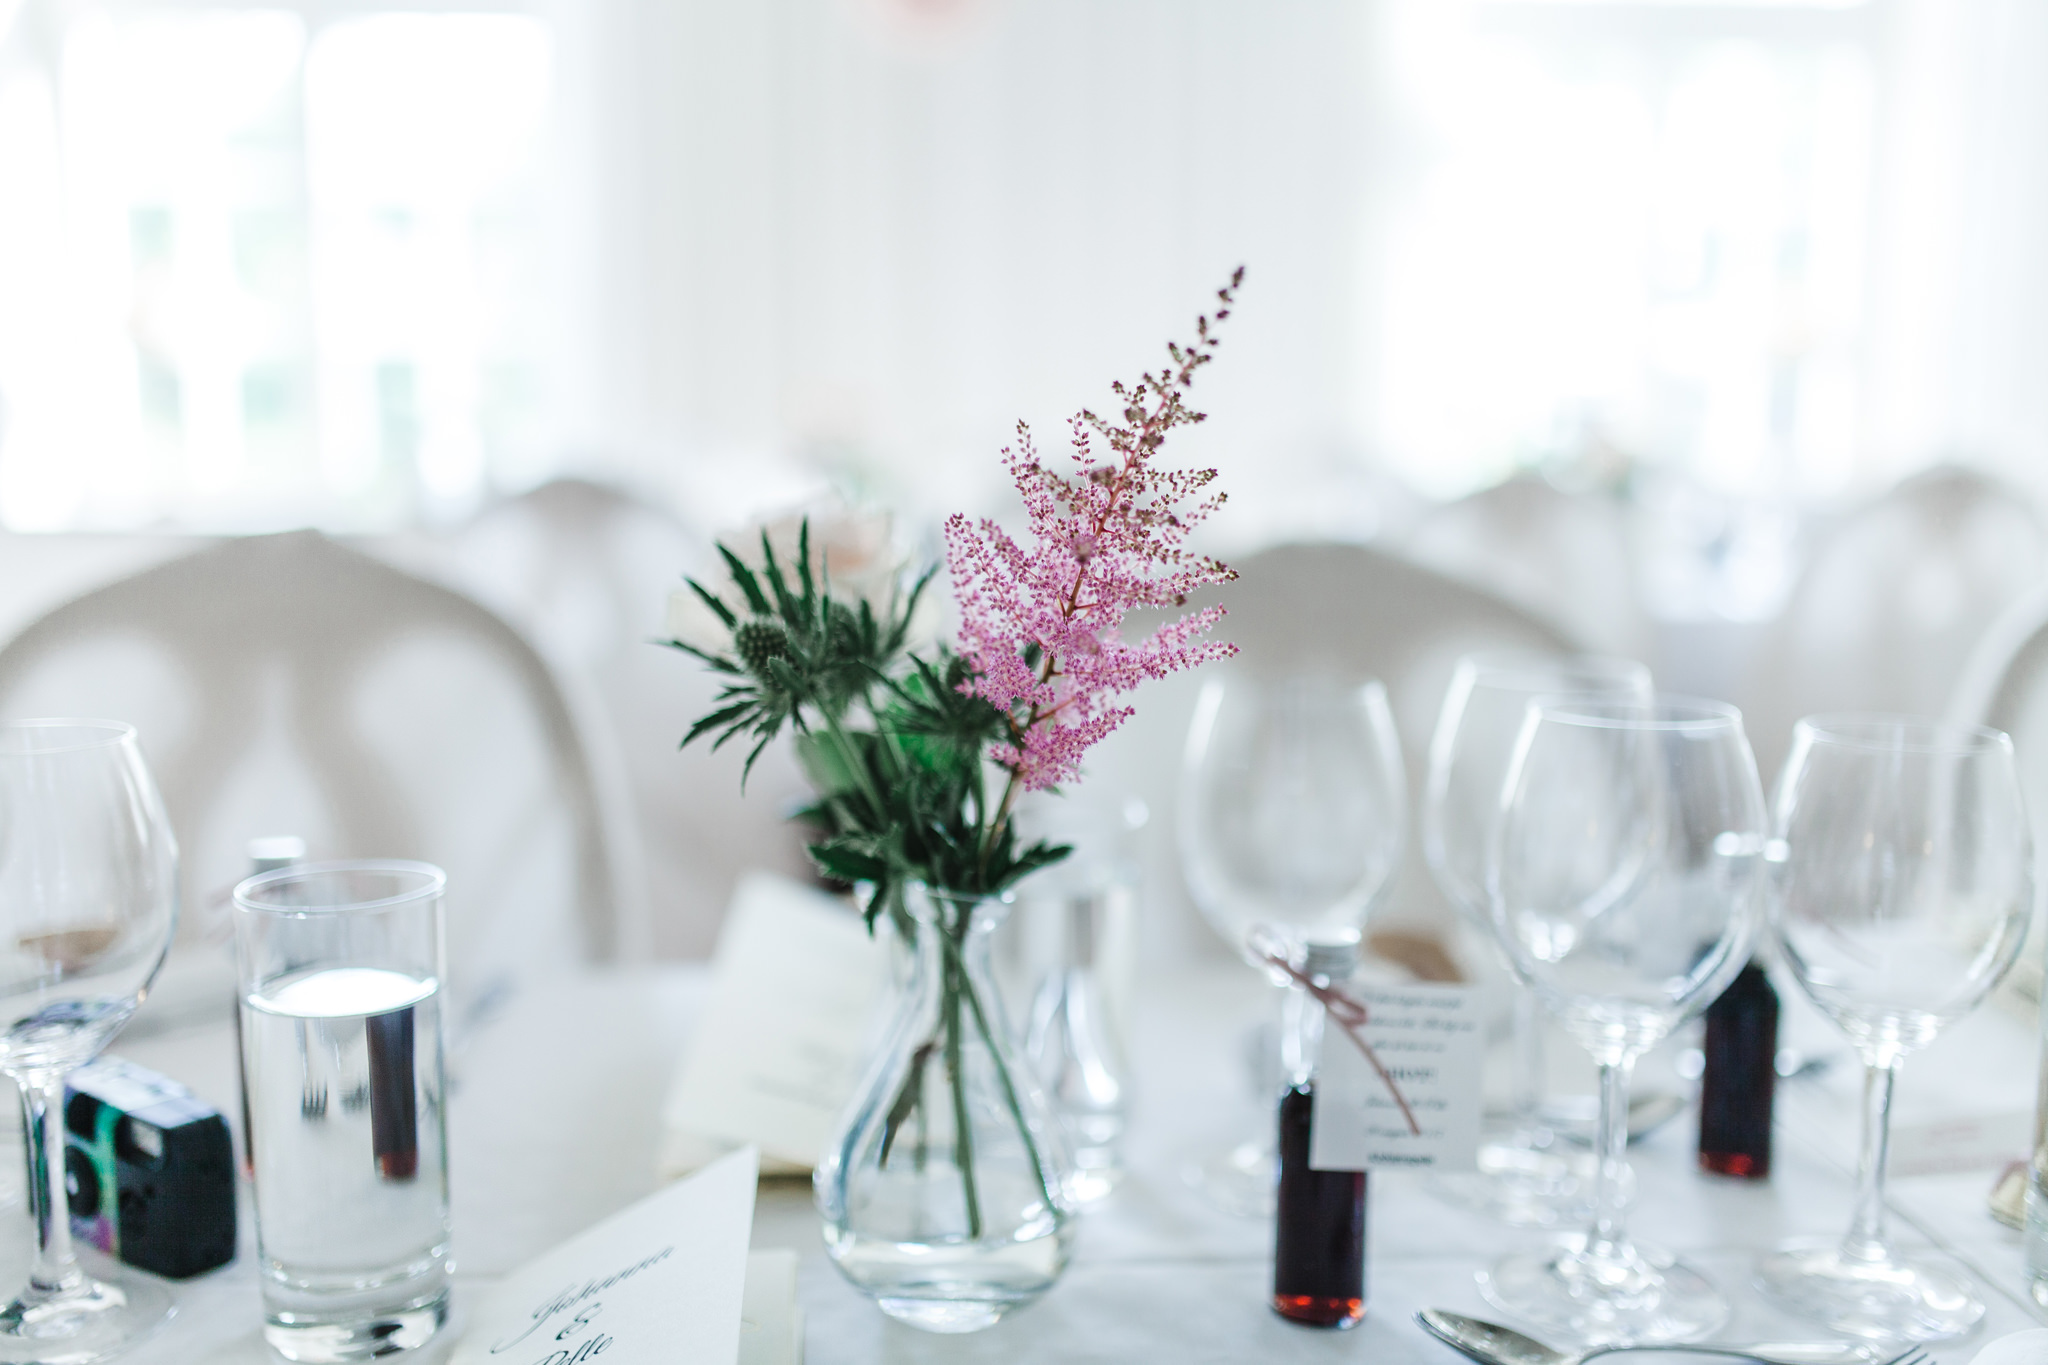 Bröllop på Blommenhof hotell i Nyköping